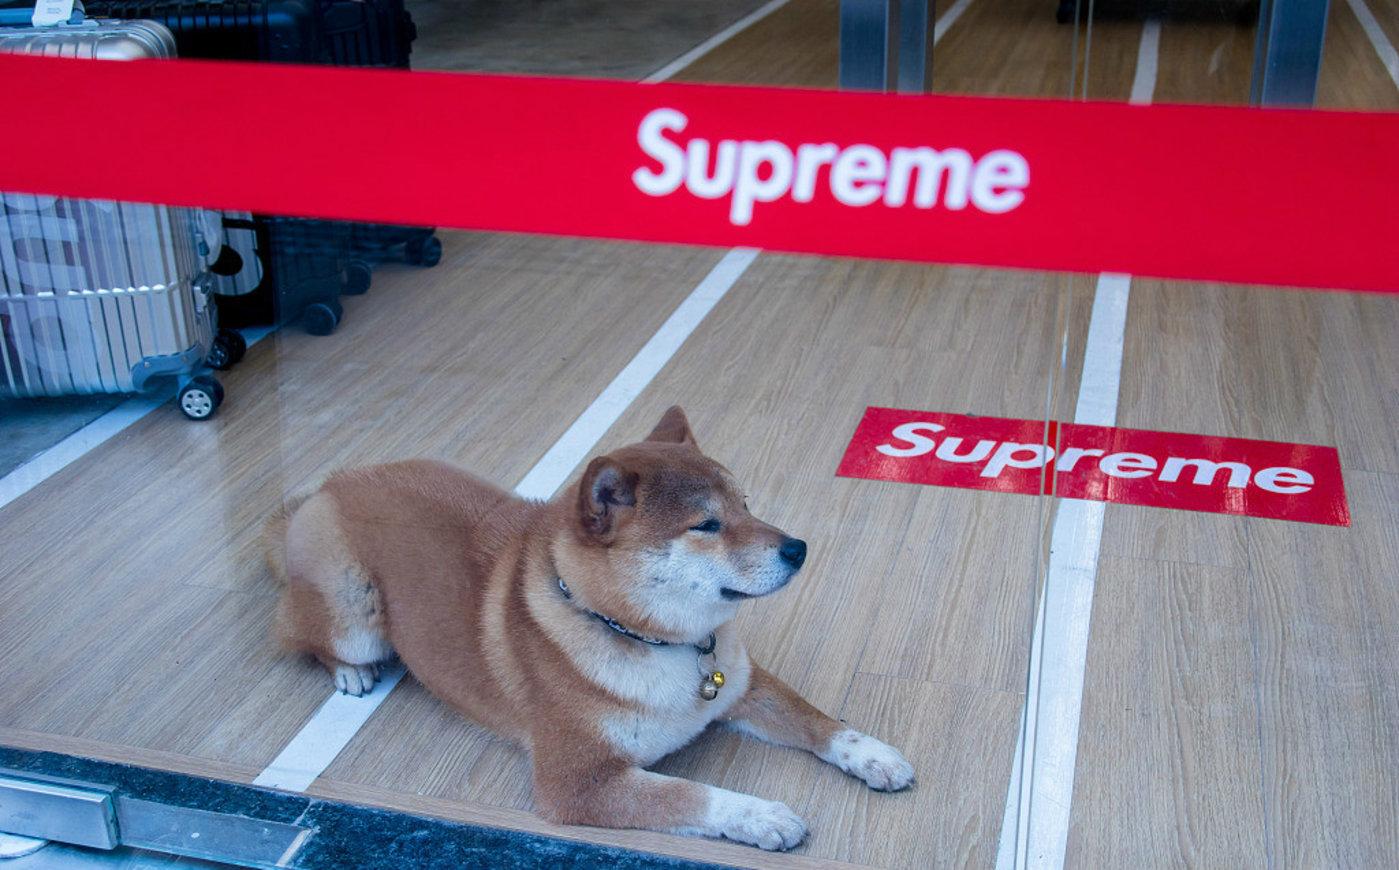 Supereme Italia 淮海路店的柴犬看门员,图片来源@视觉中国